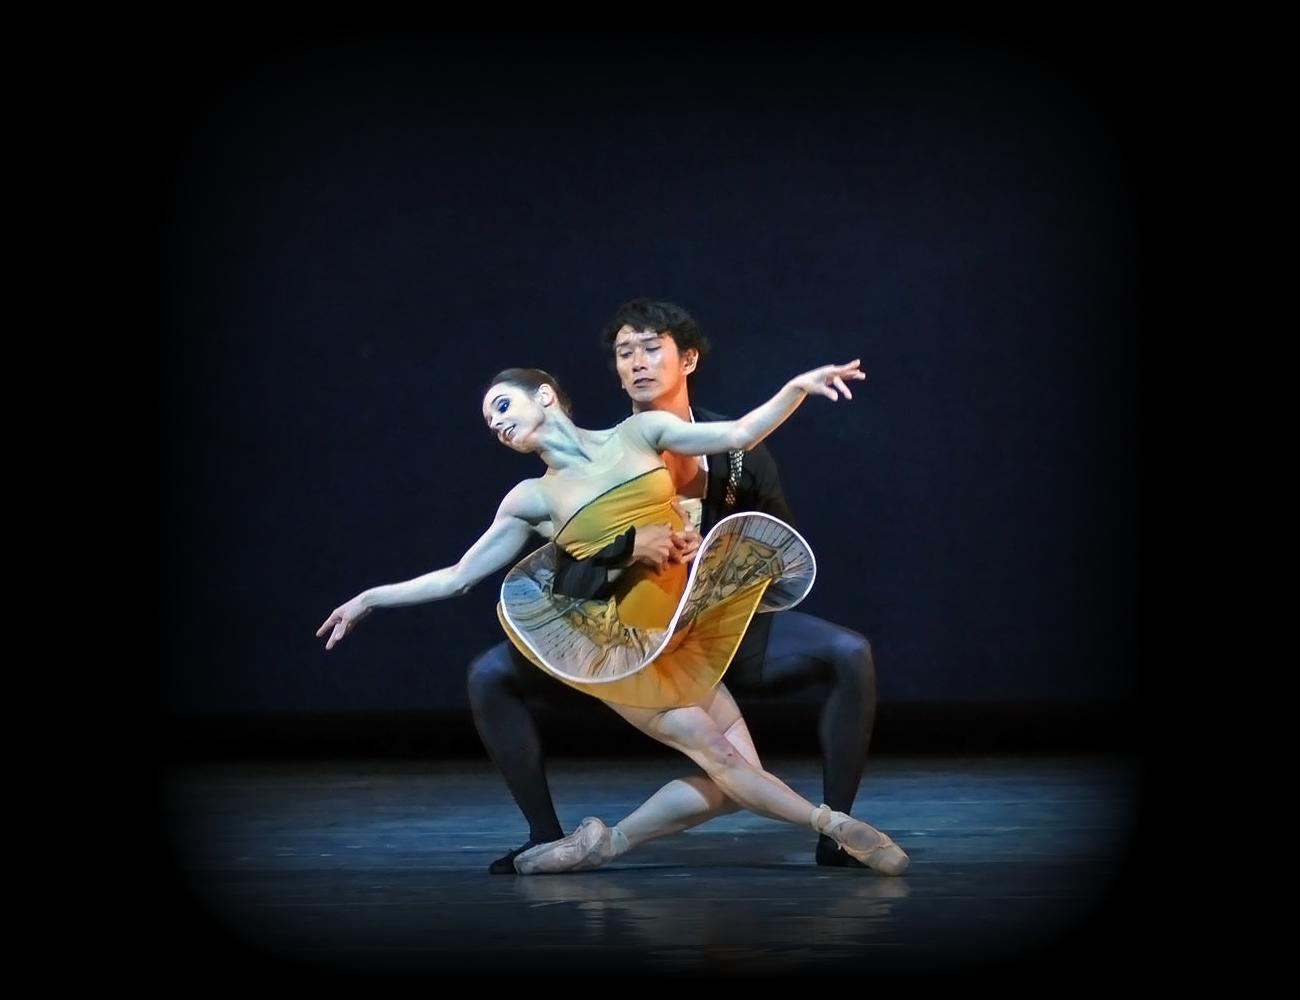 dm-classical-symphony-maria-kochetkova-hansuke-yamamoto-sink_1000.png